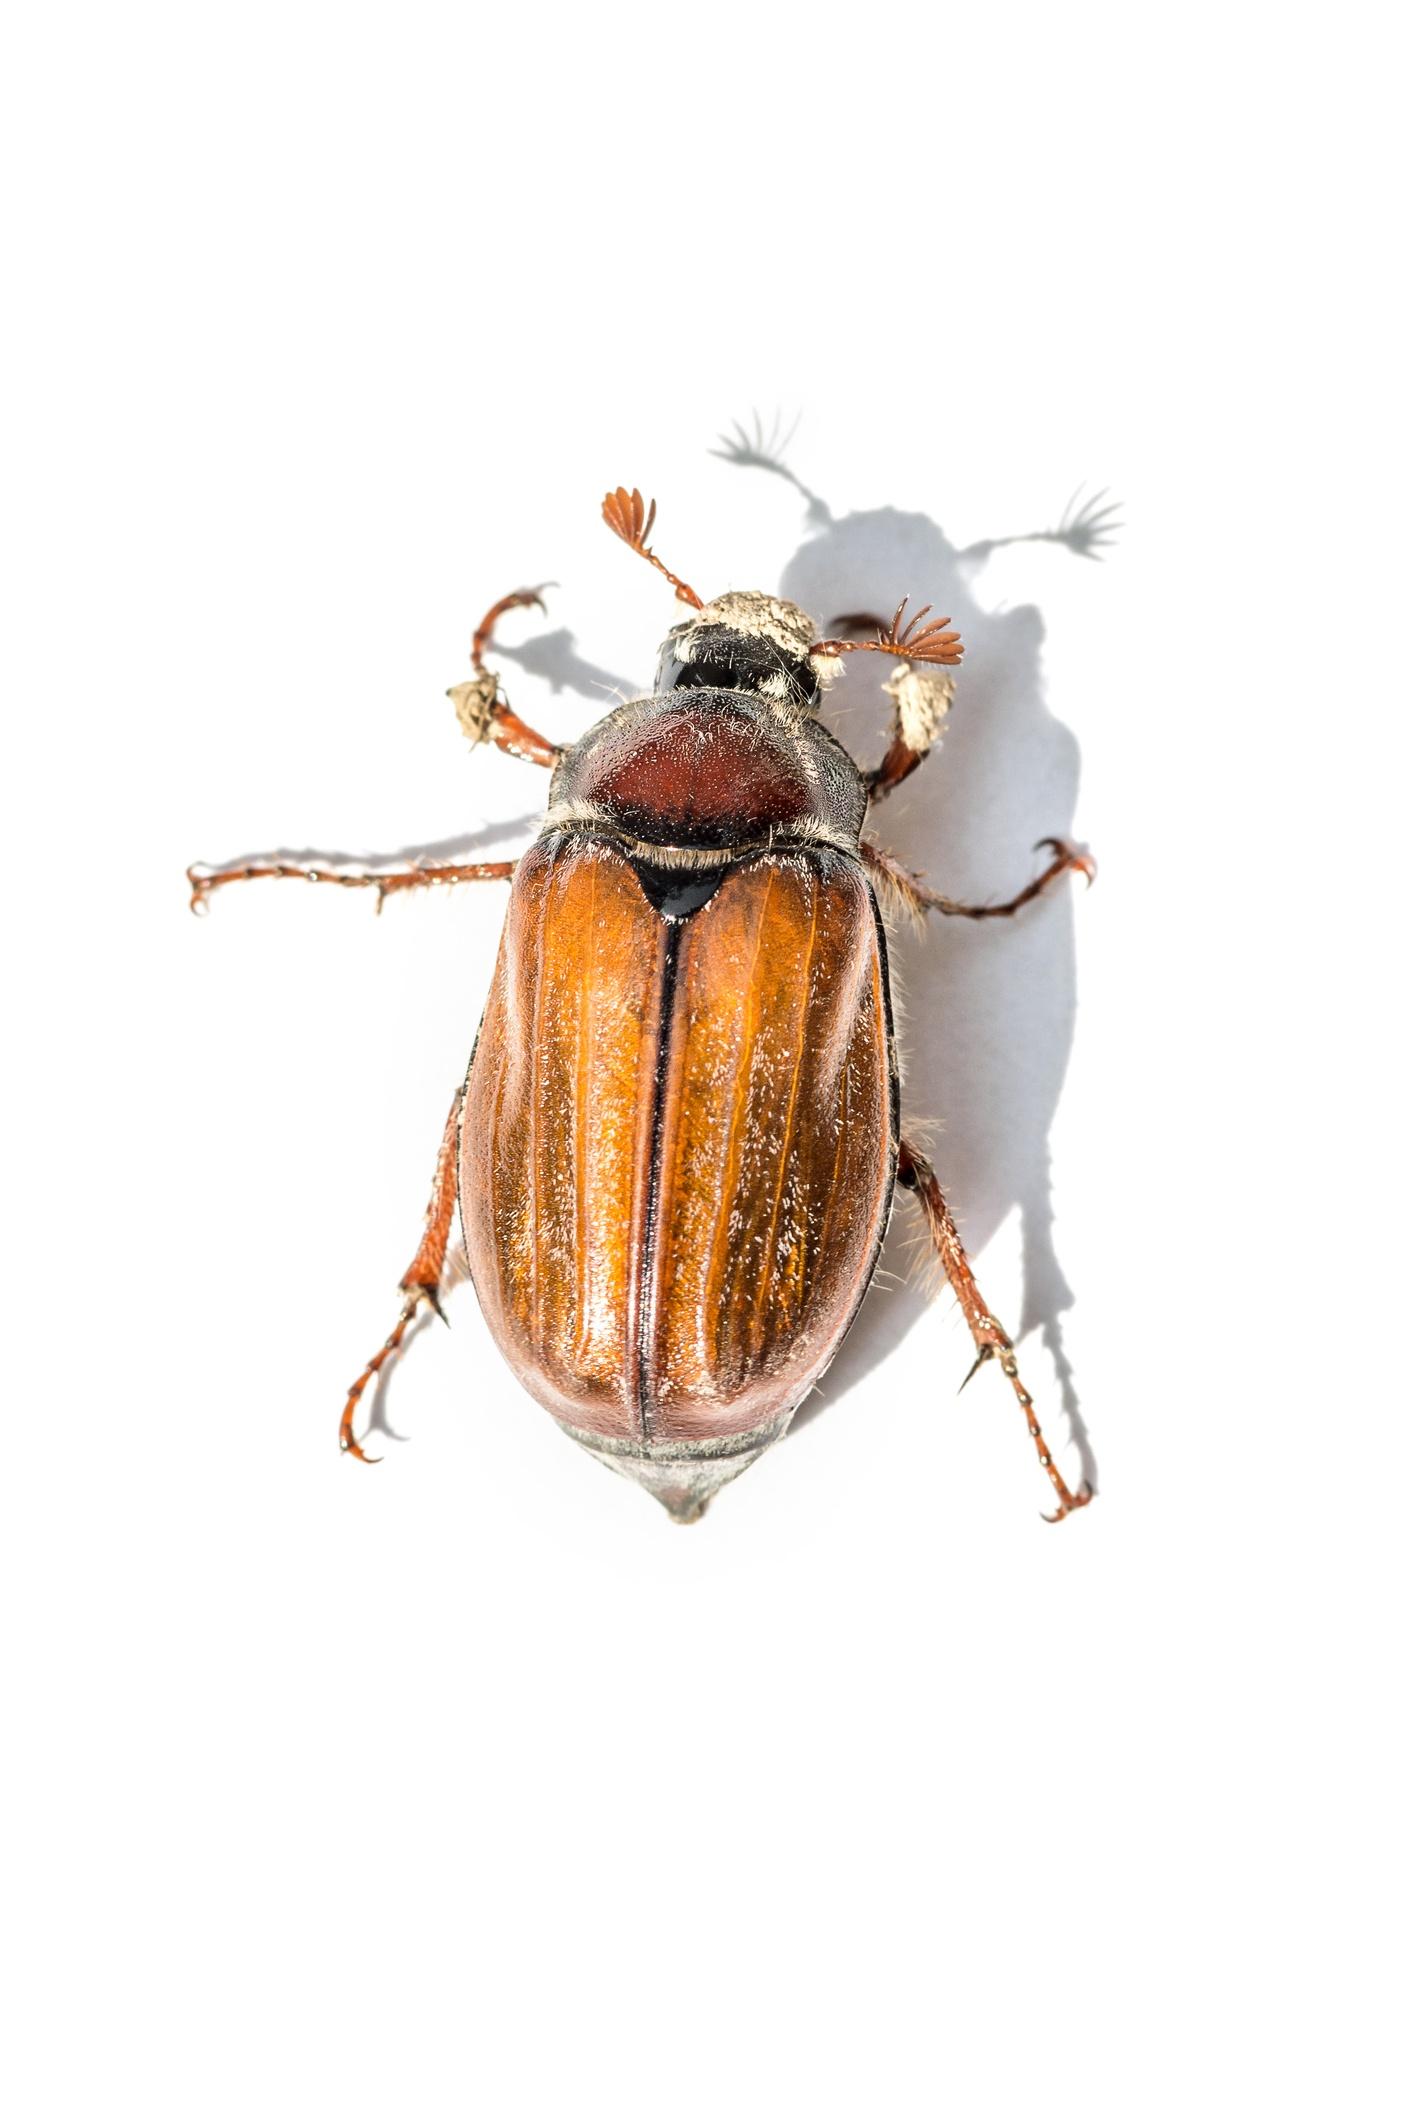 June-beetle-identification.jpg